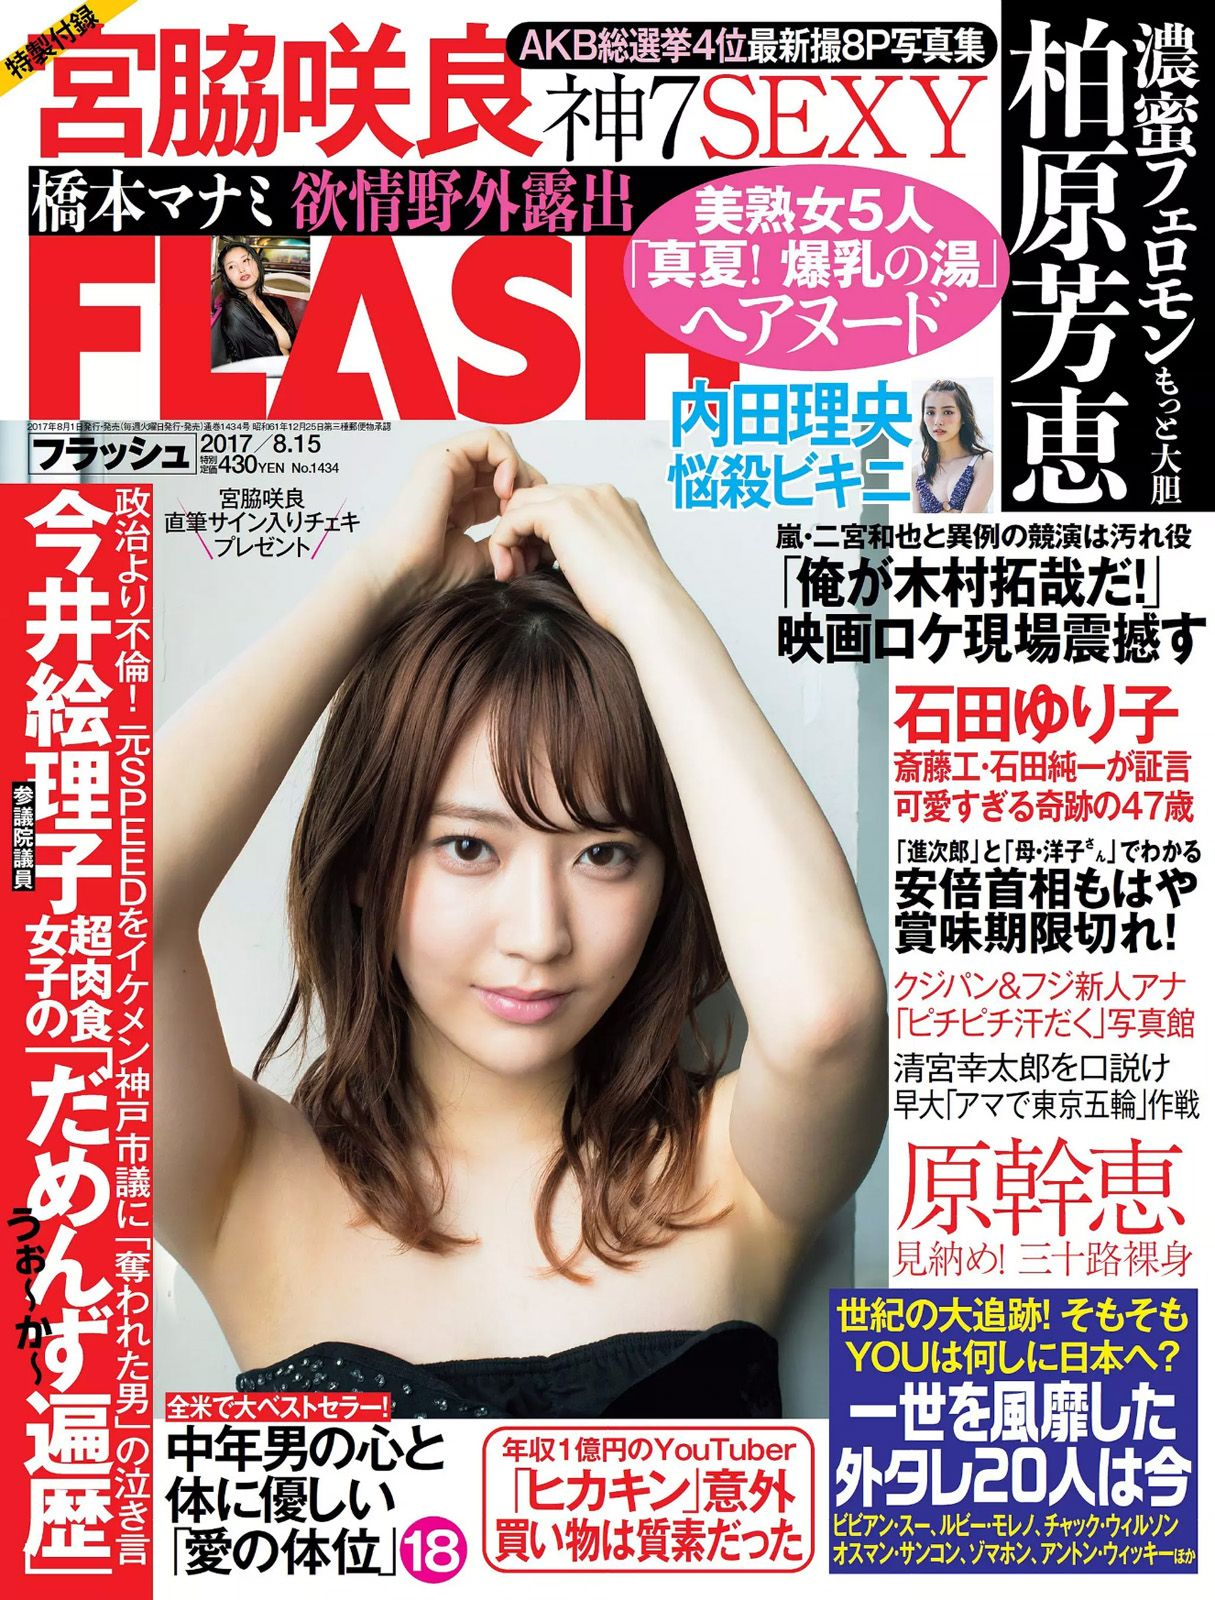 miyawaki sakura 宮脇咲良 flash 2017 08 15 フラッシュ 2017年08月15日号